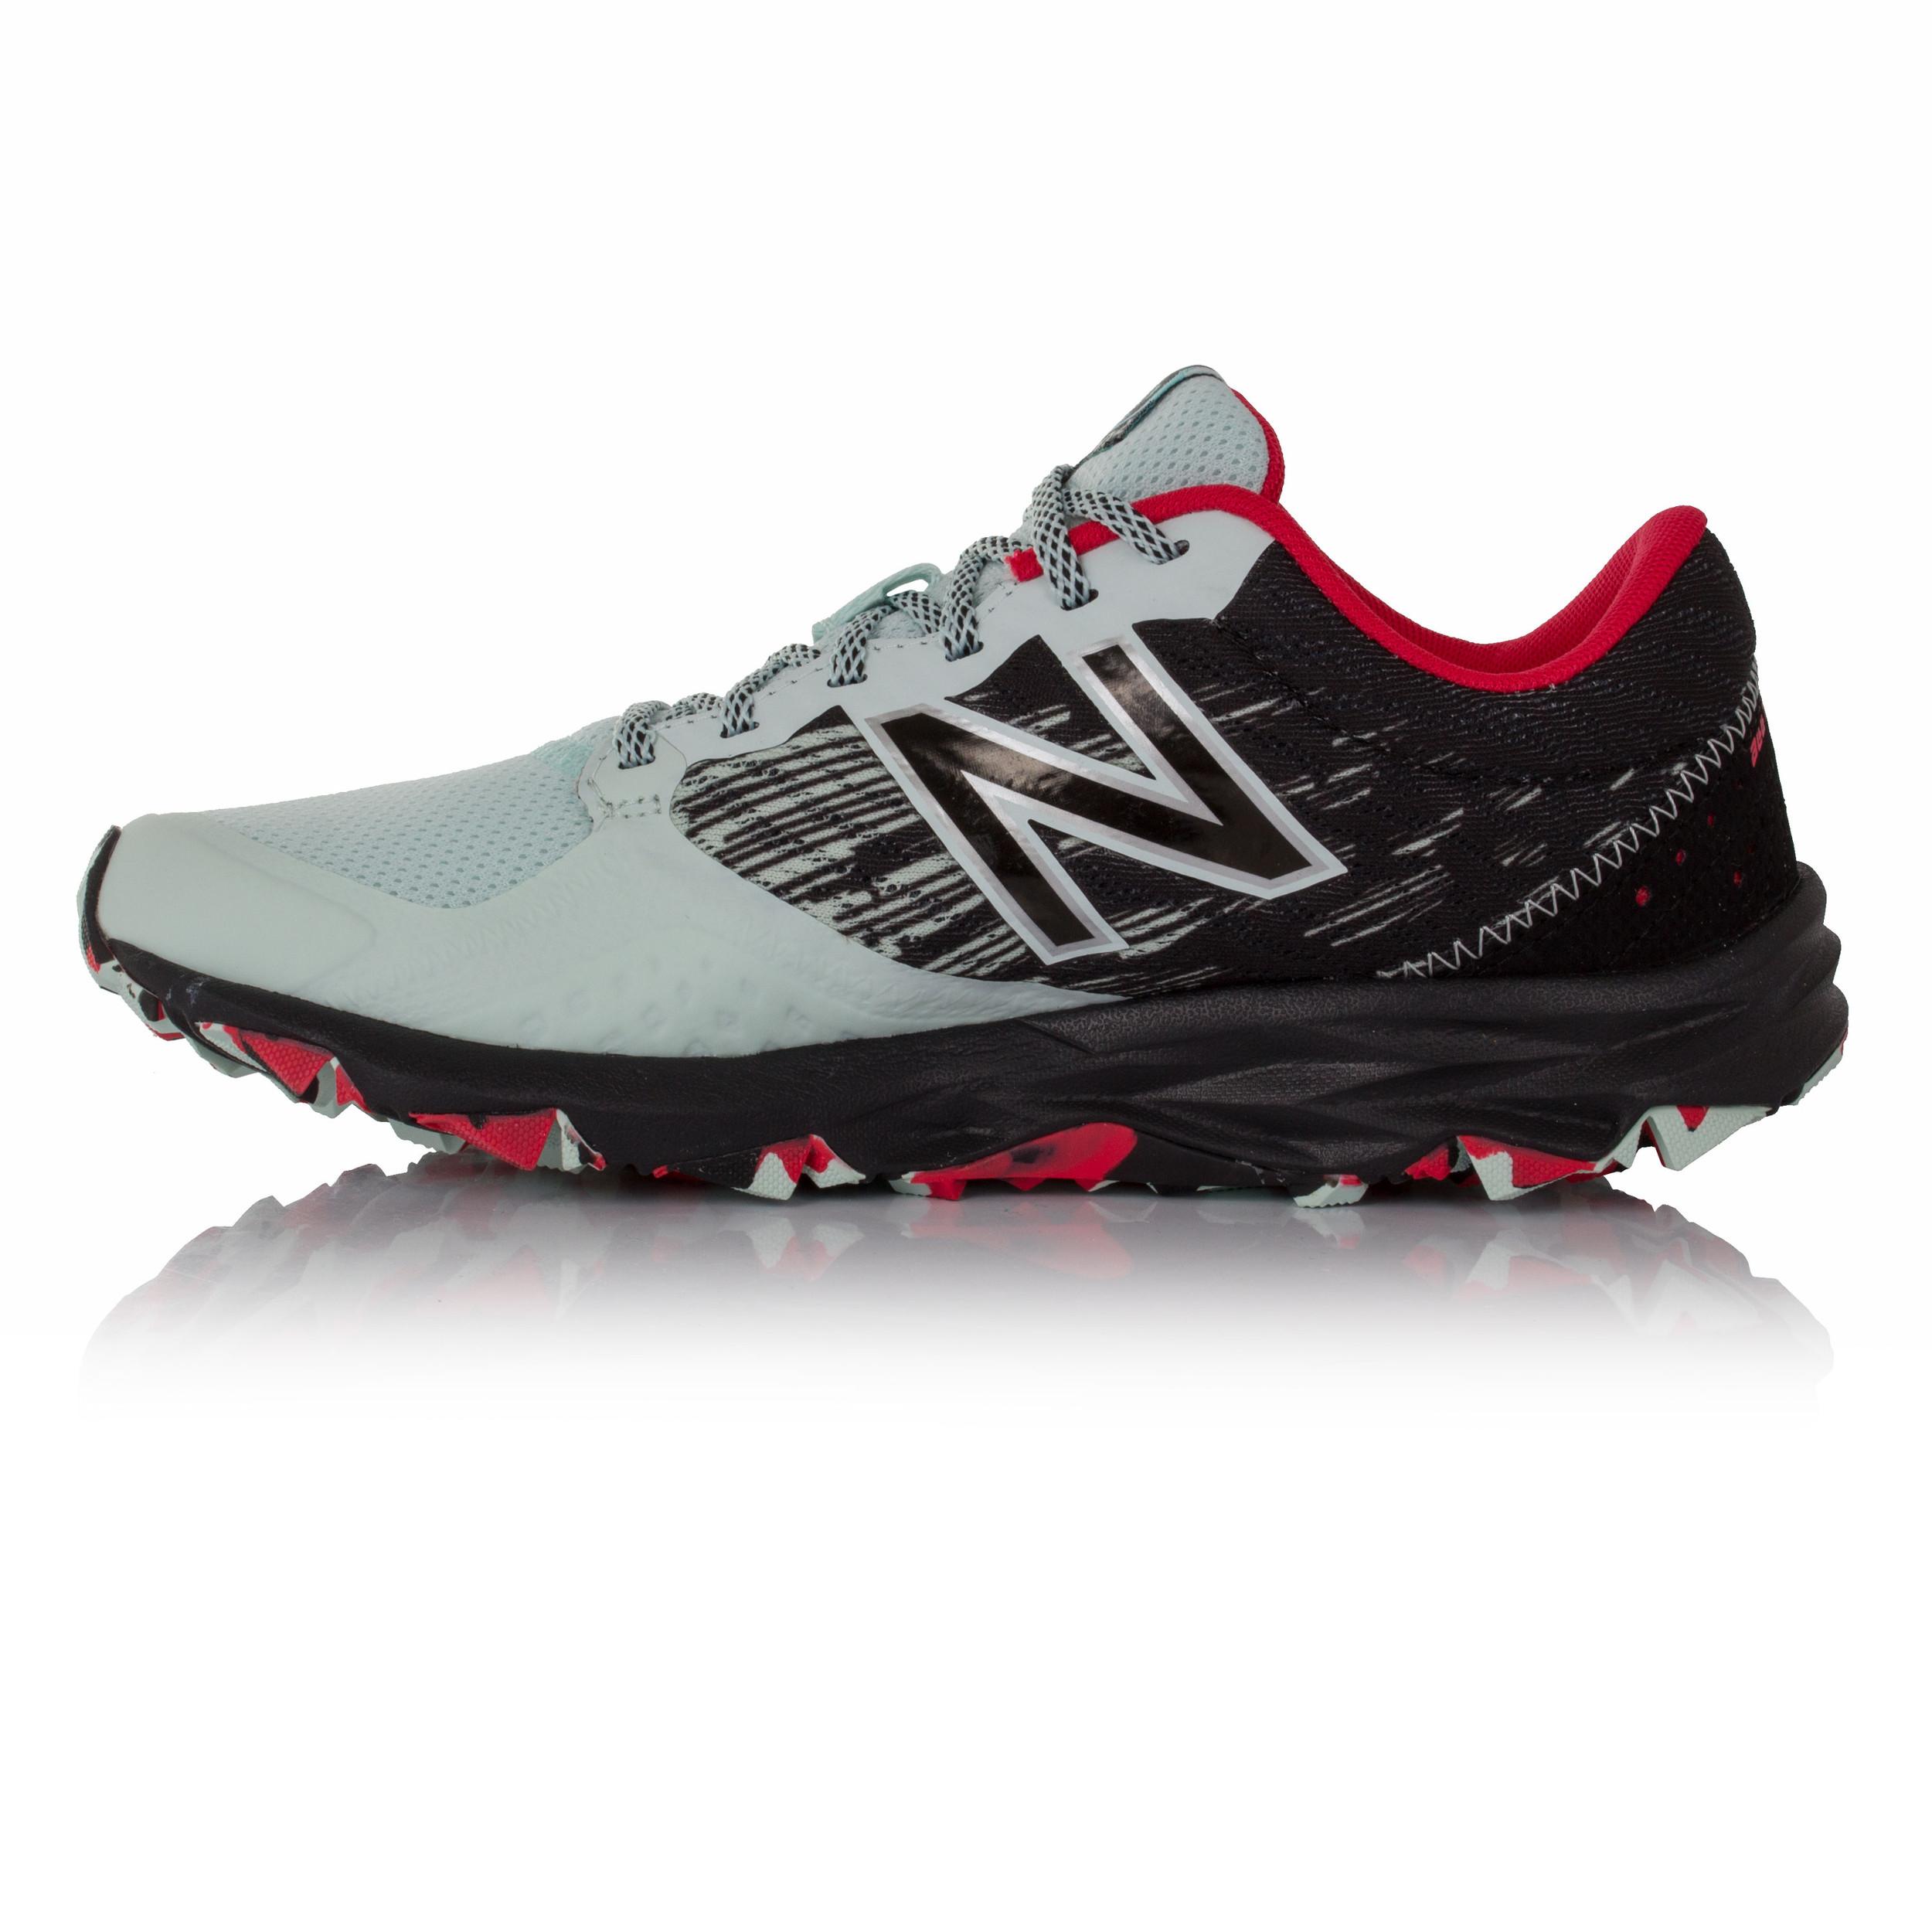 New-Balance-WT690v2-Womens-Blue-Black-Trail-Running-